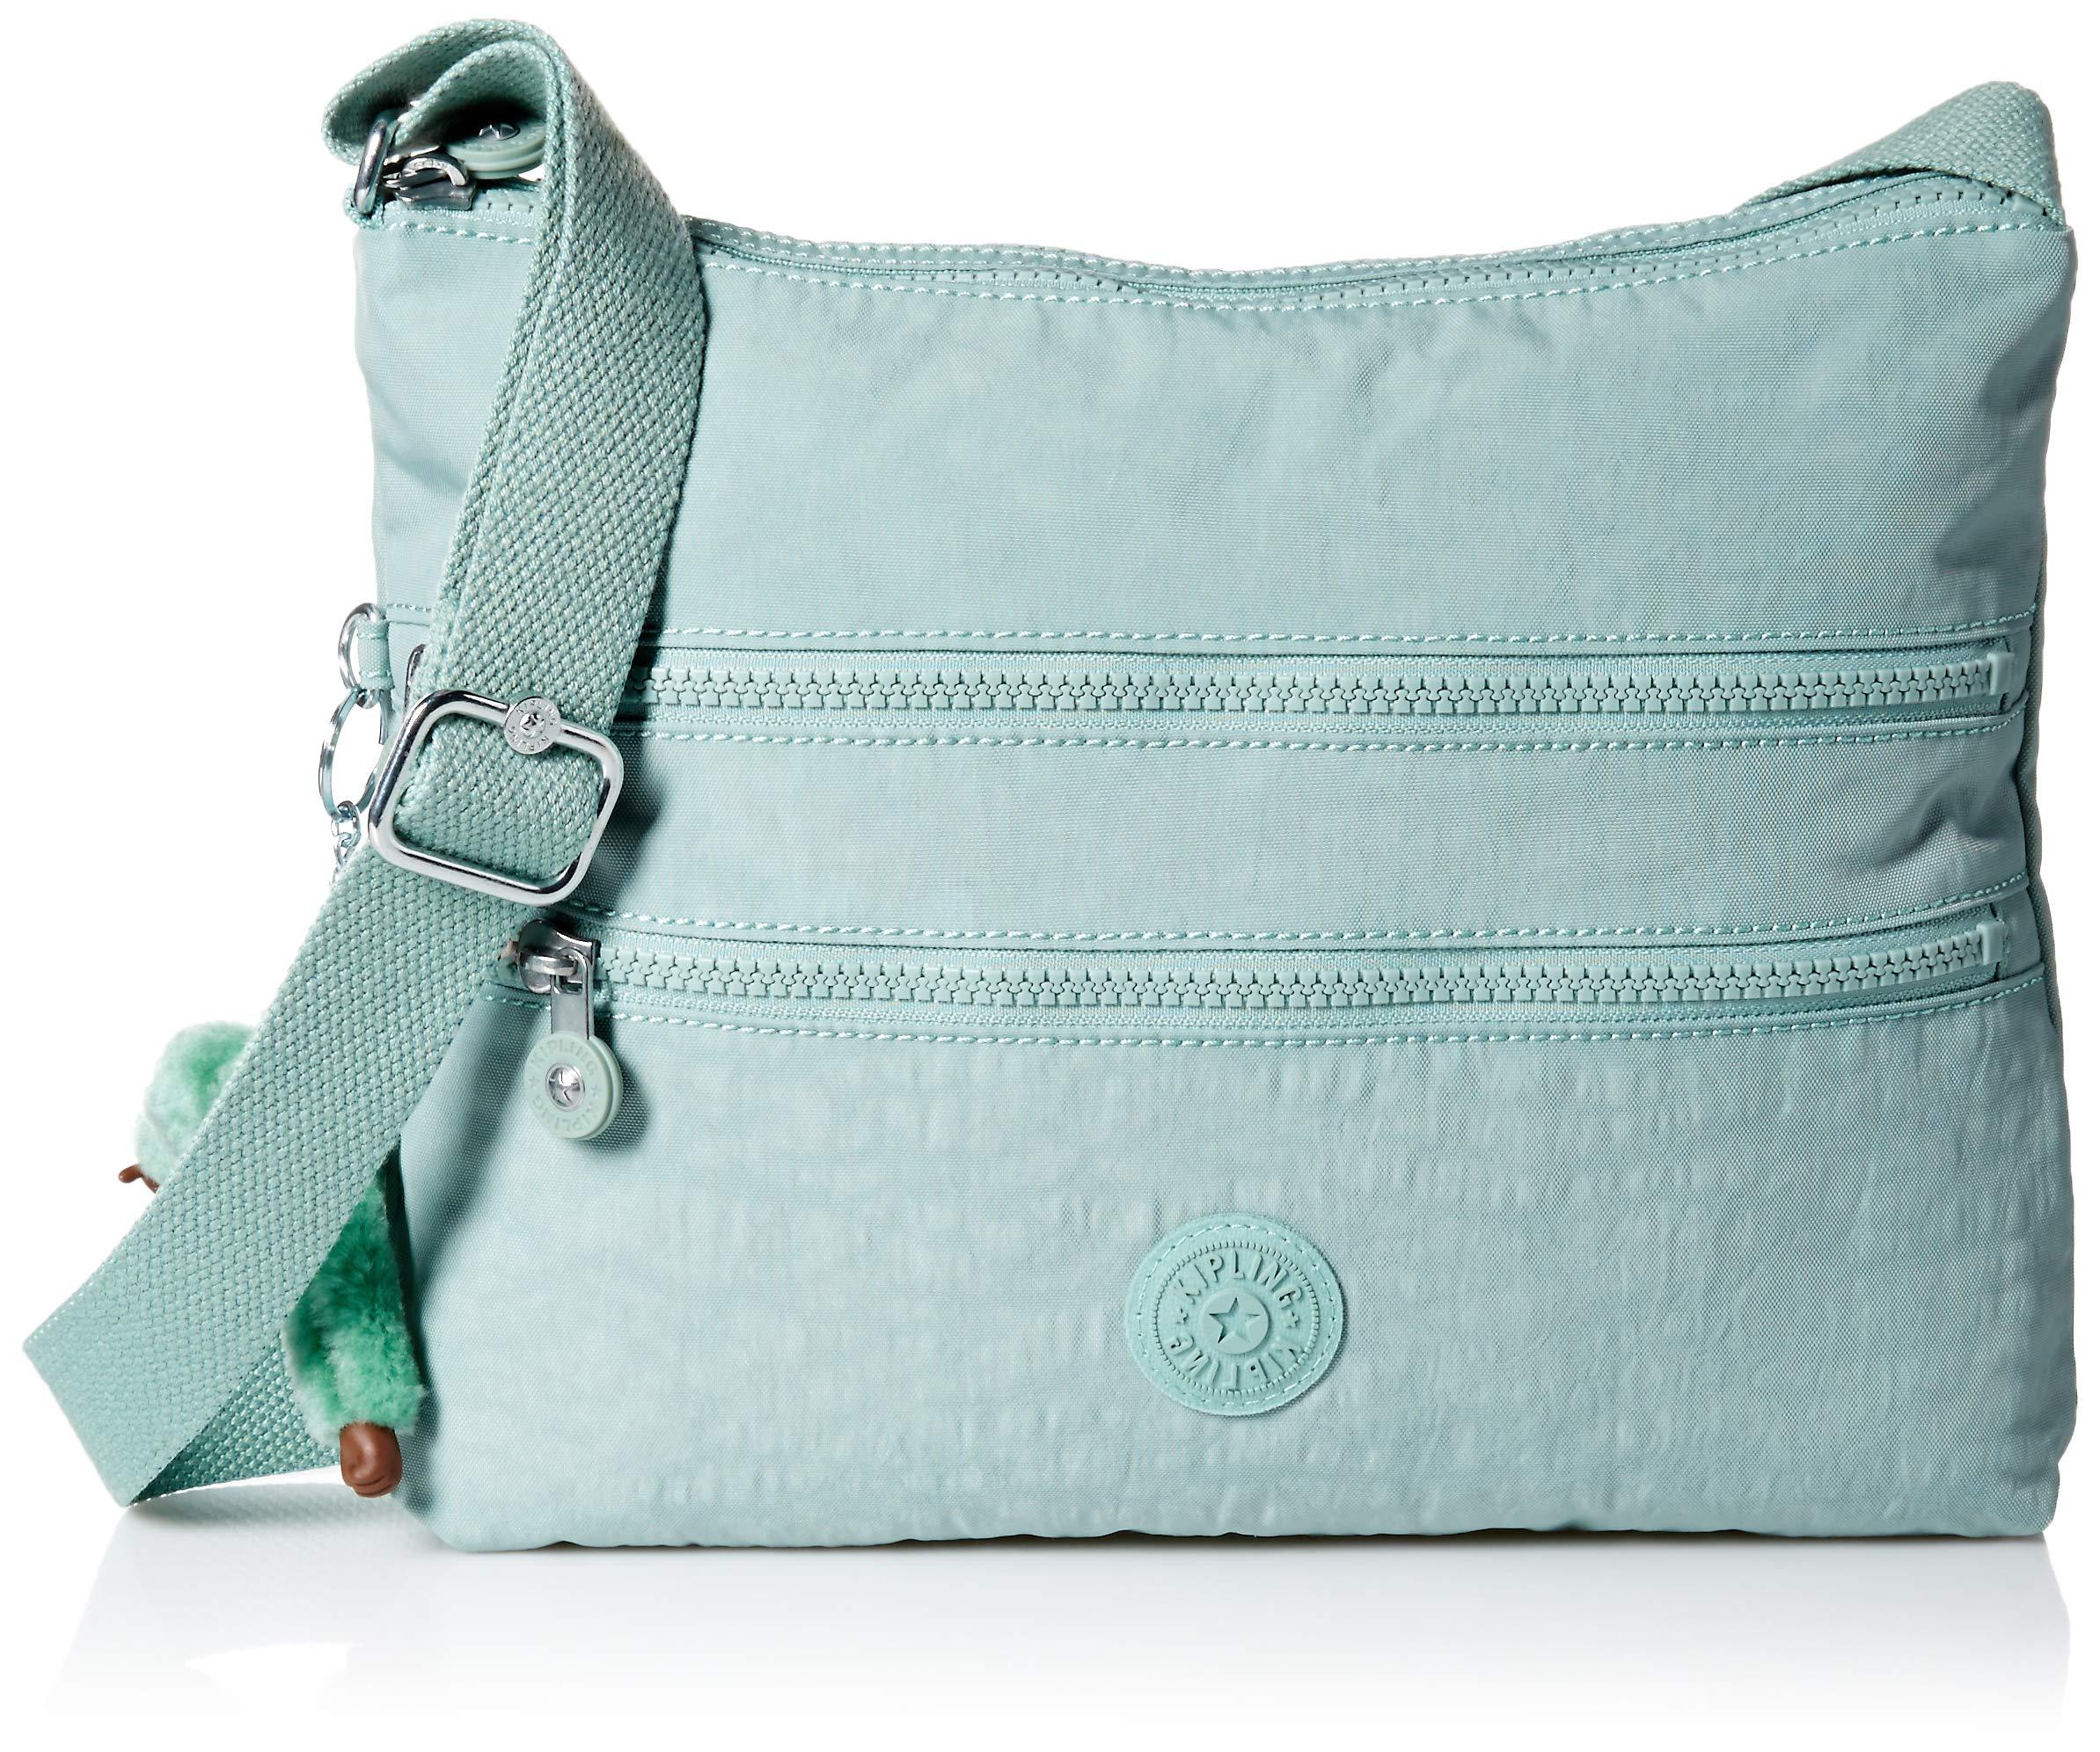 Kipling Women's Alvar Bag, Adjustable Crossbody Strap, Zip Closure, Fern Green Tonal